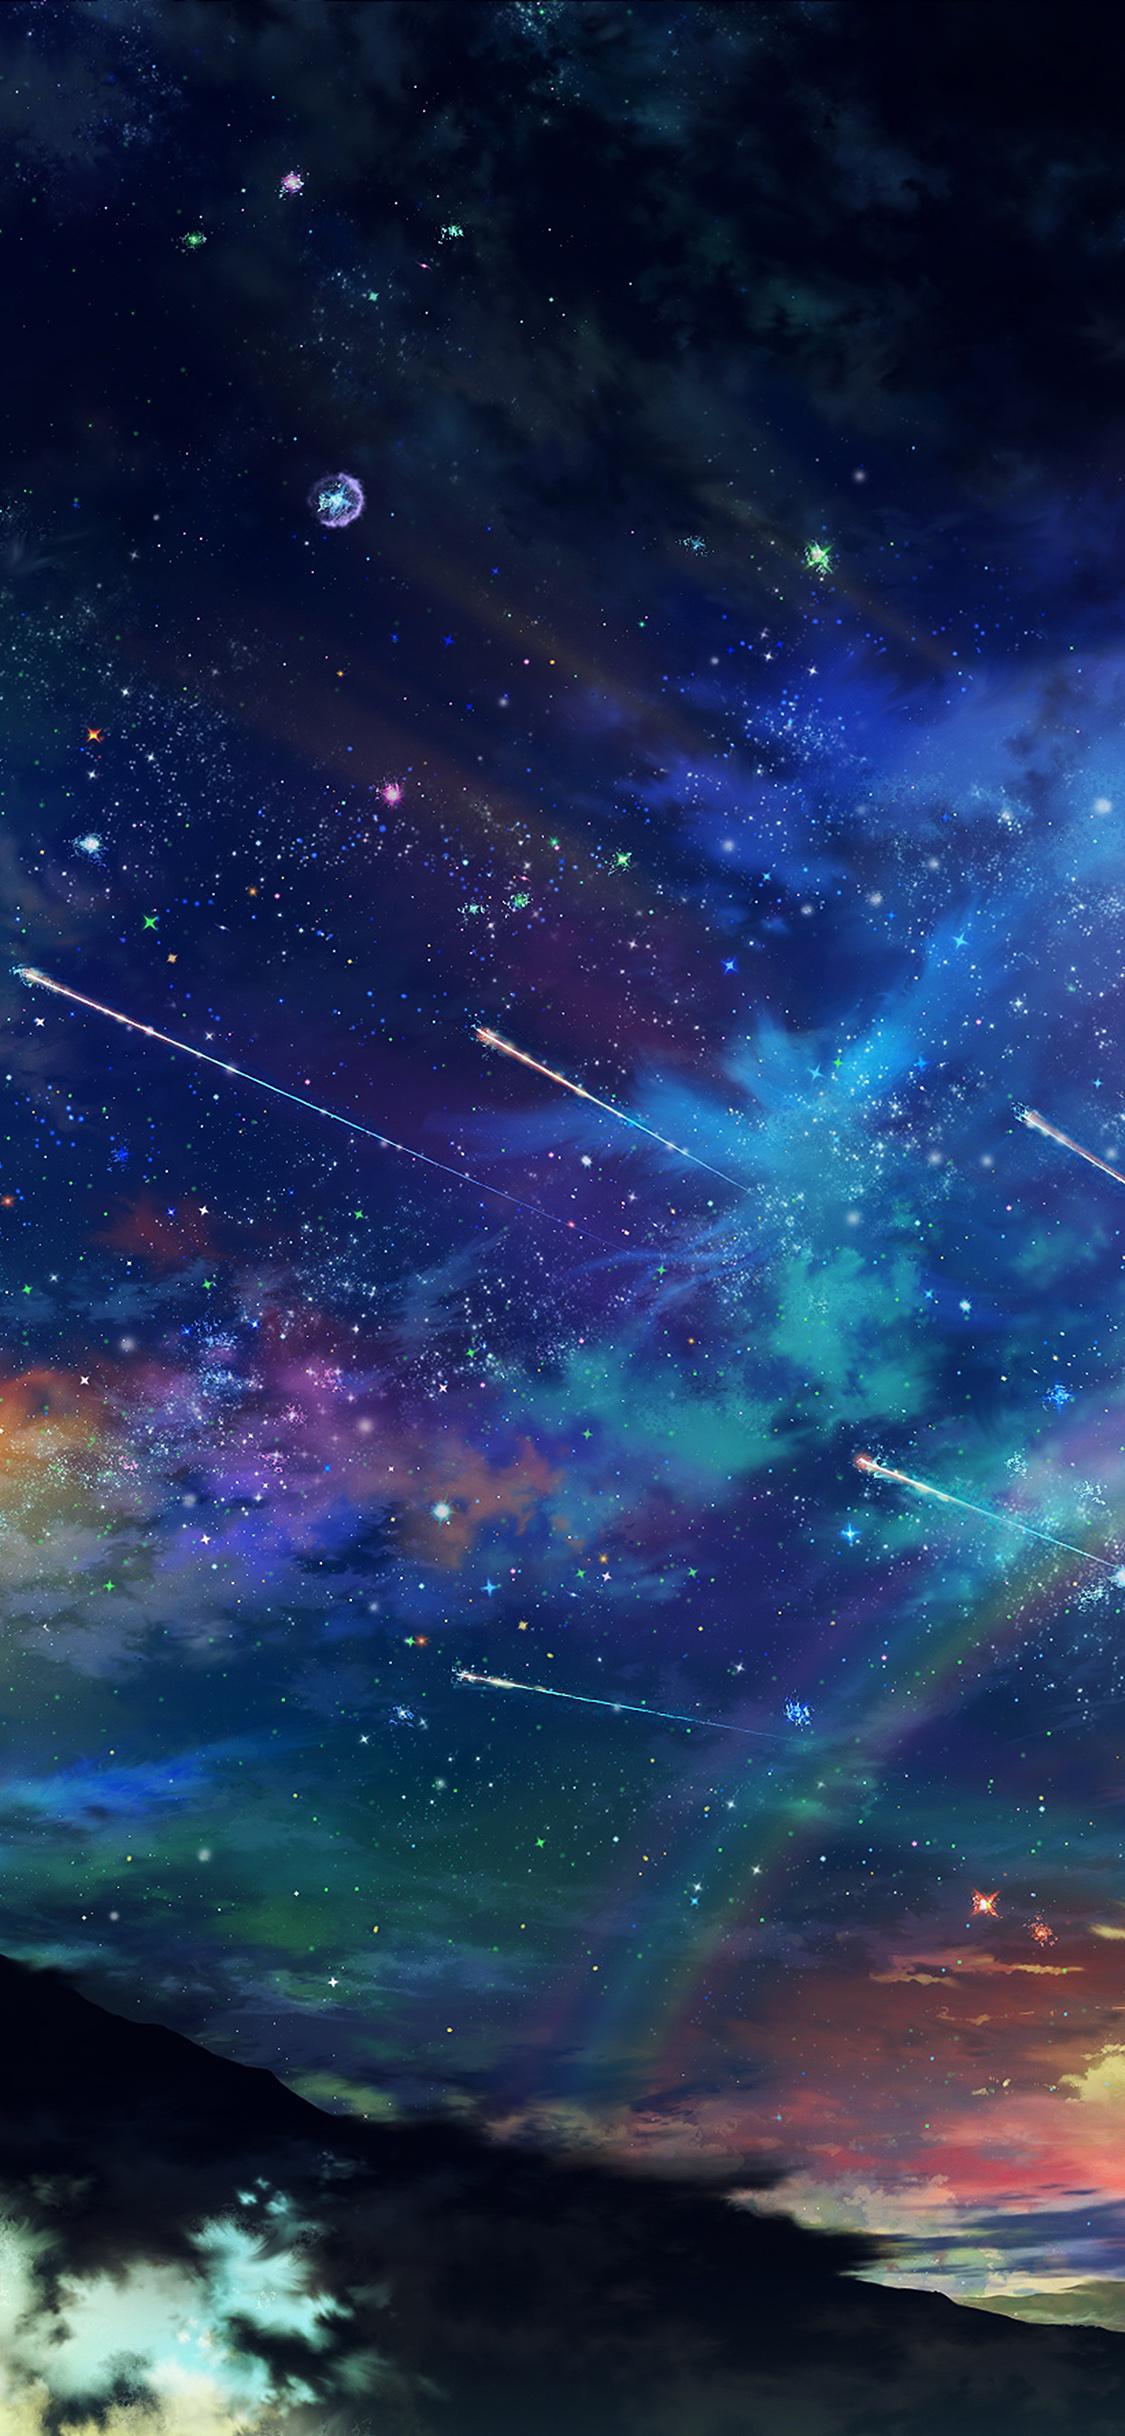 Am61 Amazing Wonderful Tonight Sky Dark Star Space Wallpaper